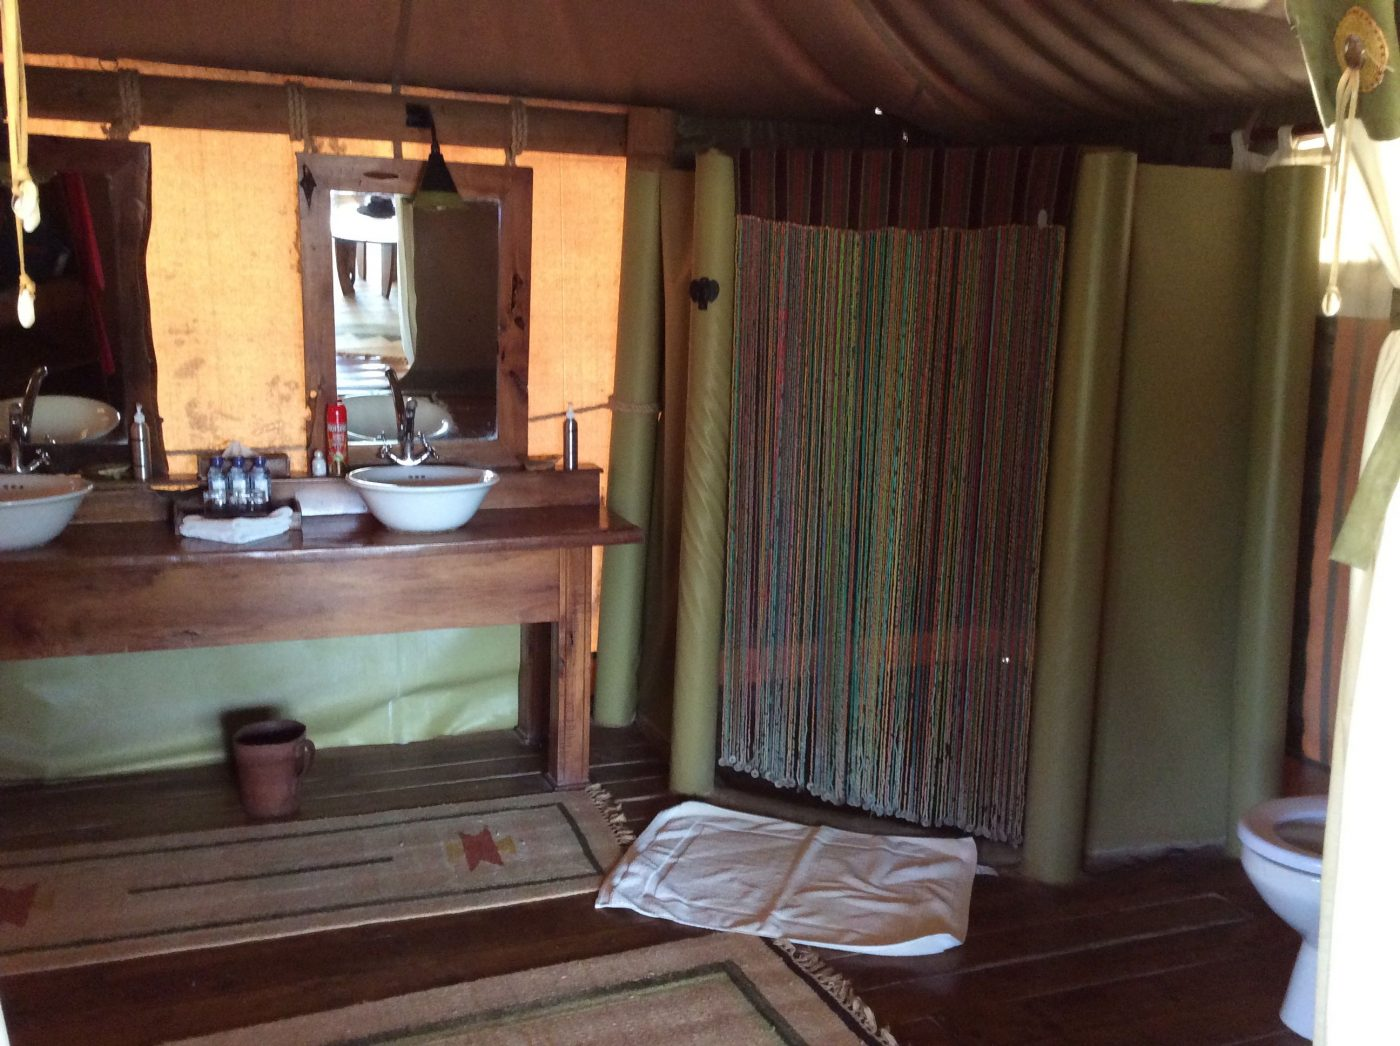 Safari Lodges in Kenya: Bathroom of Elephant Camp